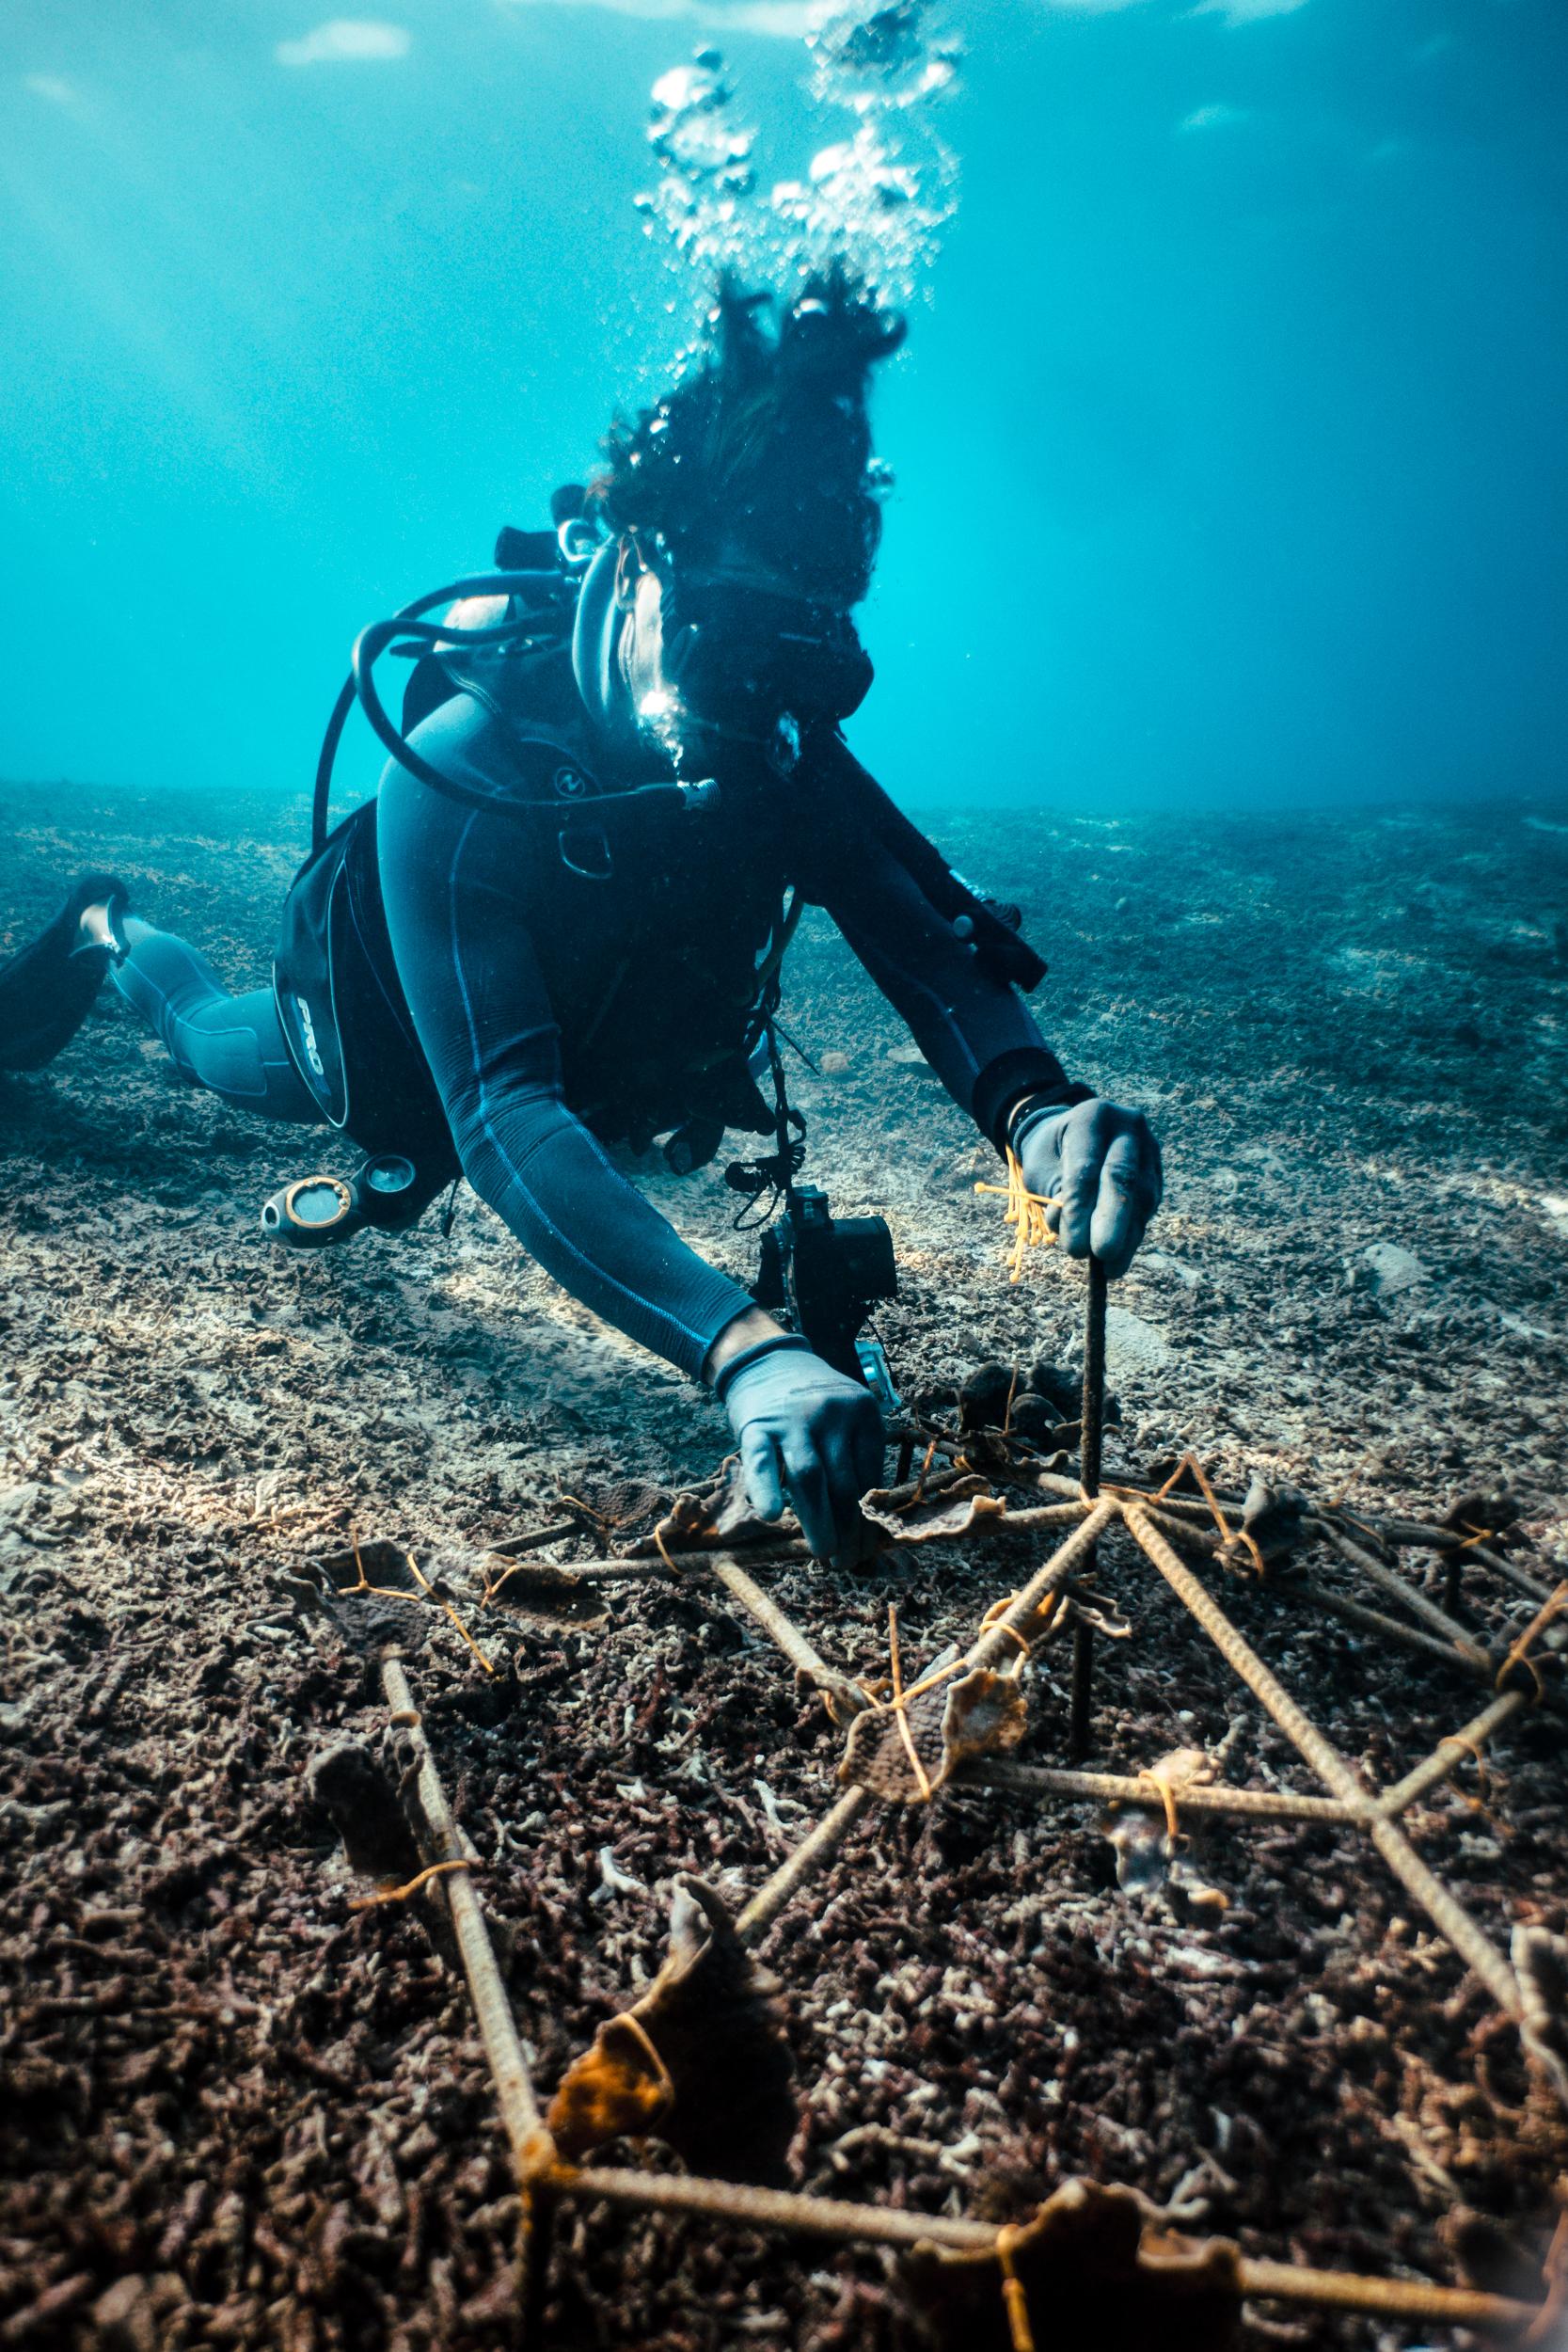 Andrew Taylor transplanting coral